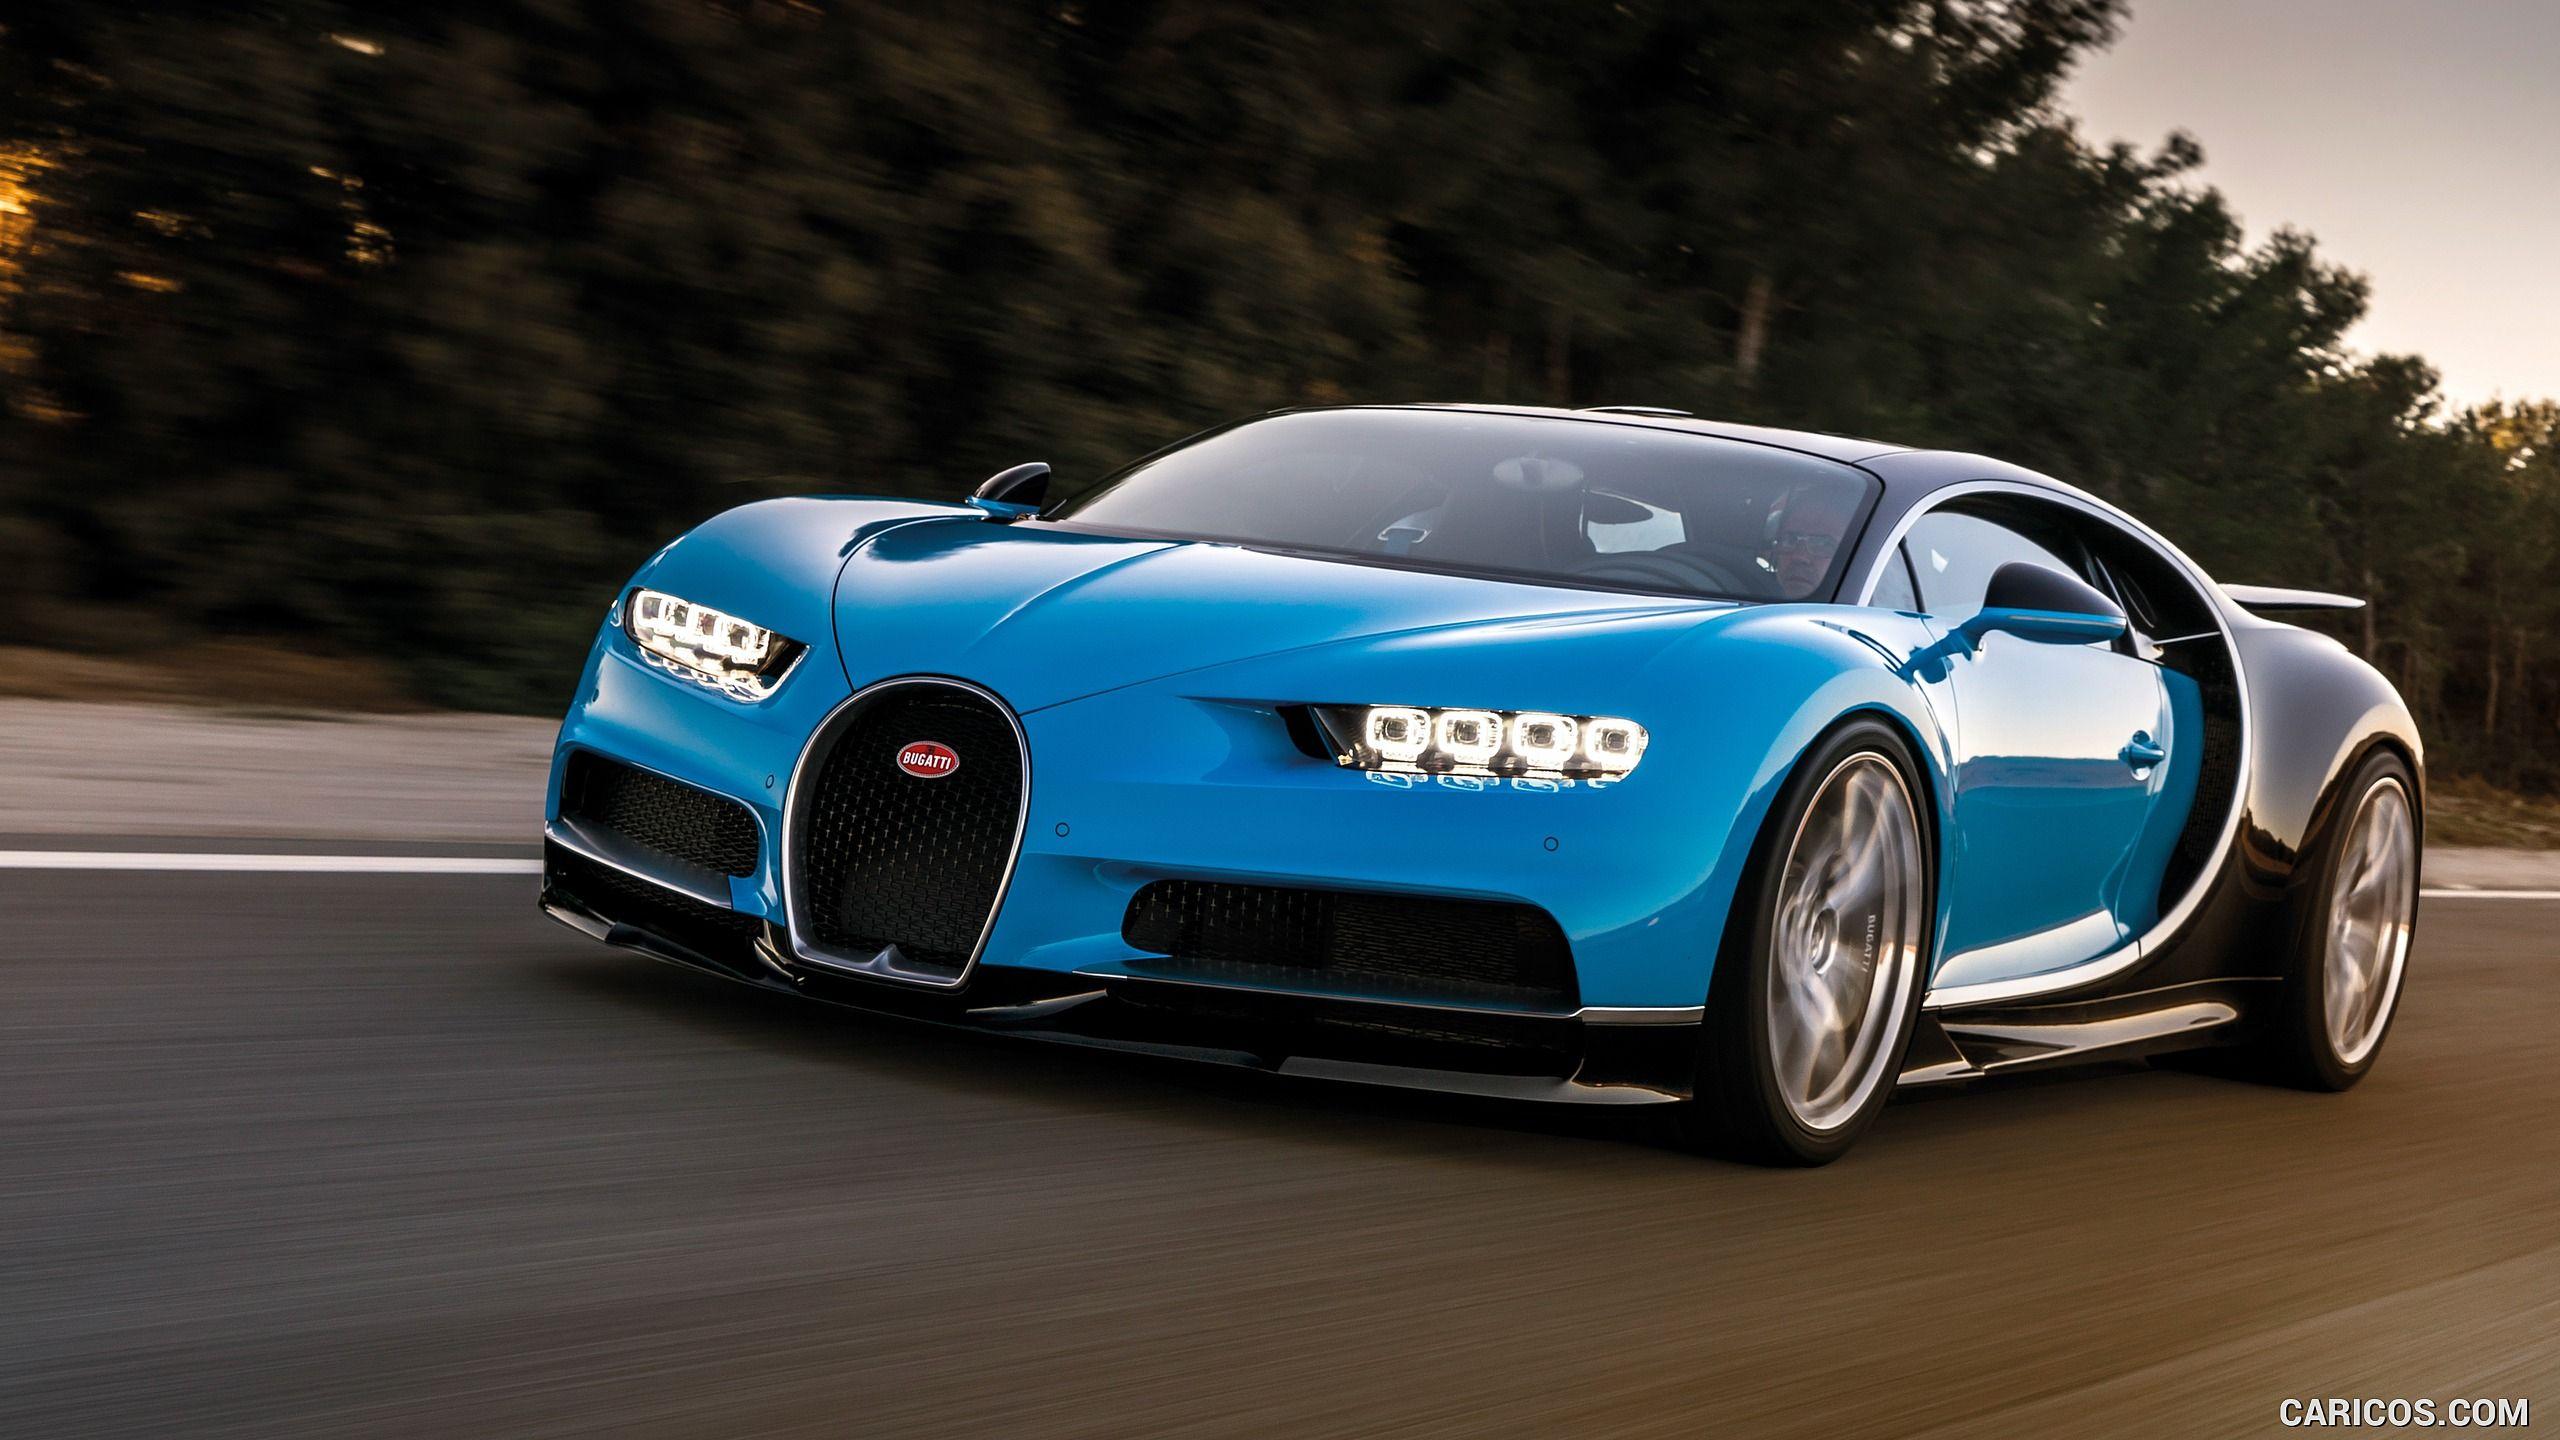 2017 Bugatti Chiron Wallpaper Bugatti Cars Bugatti Chiron Bugatti